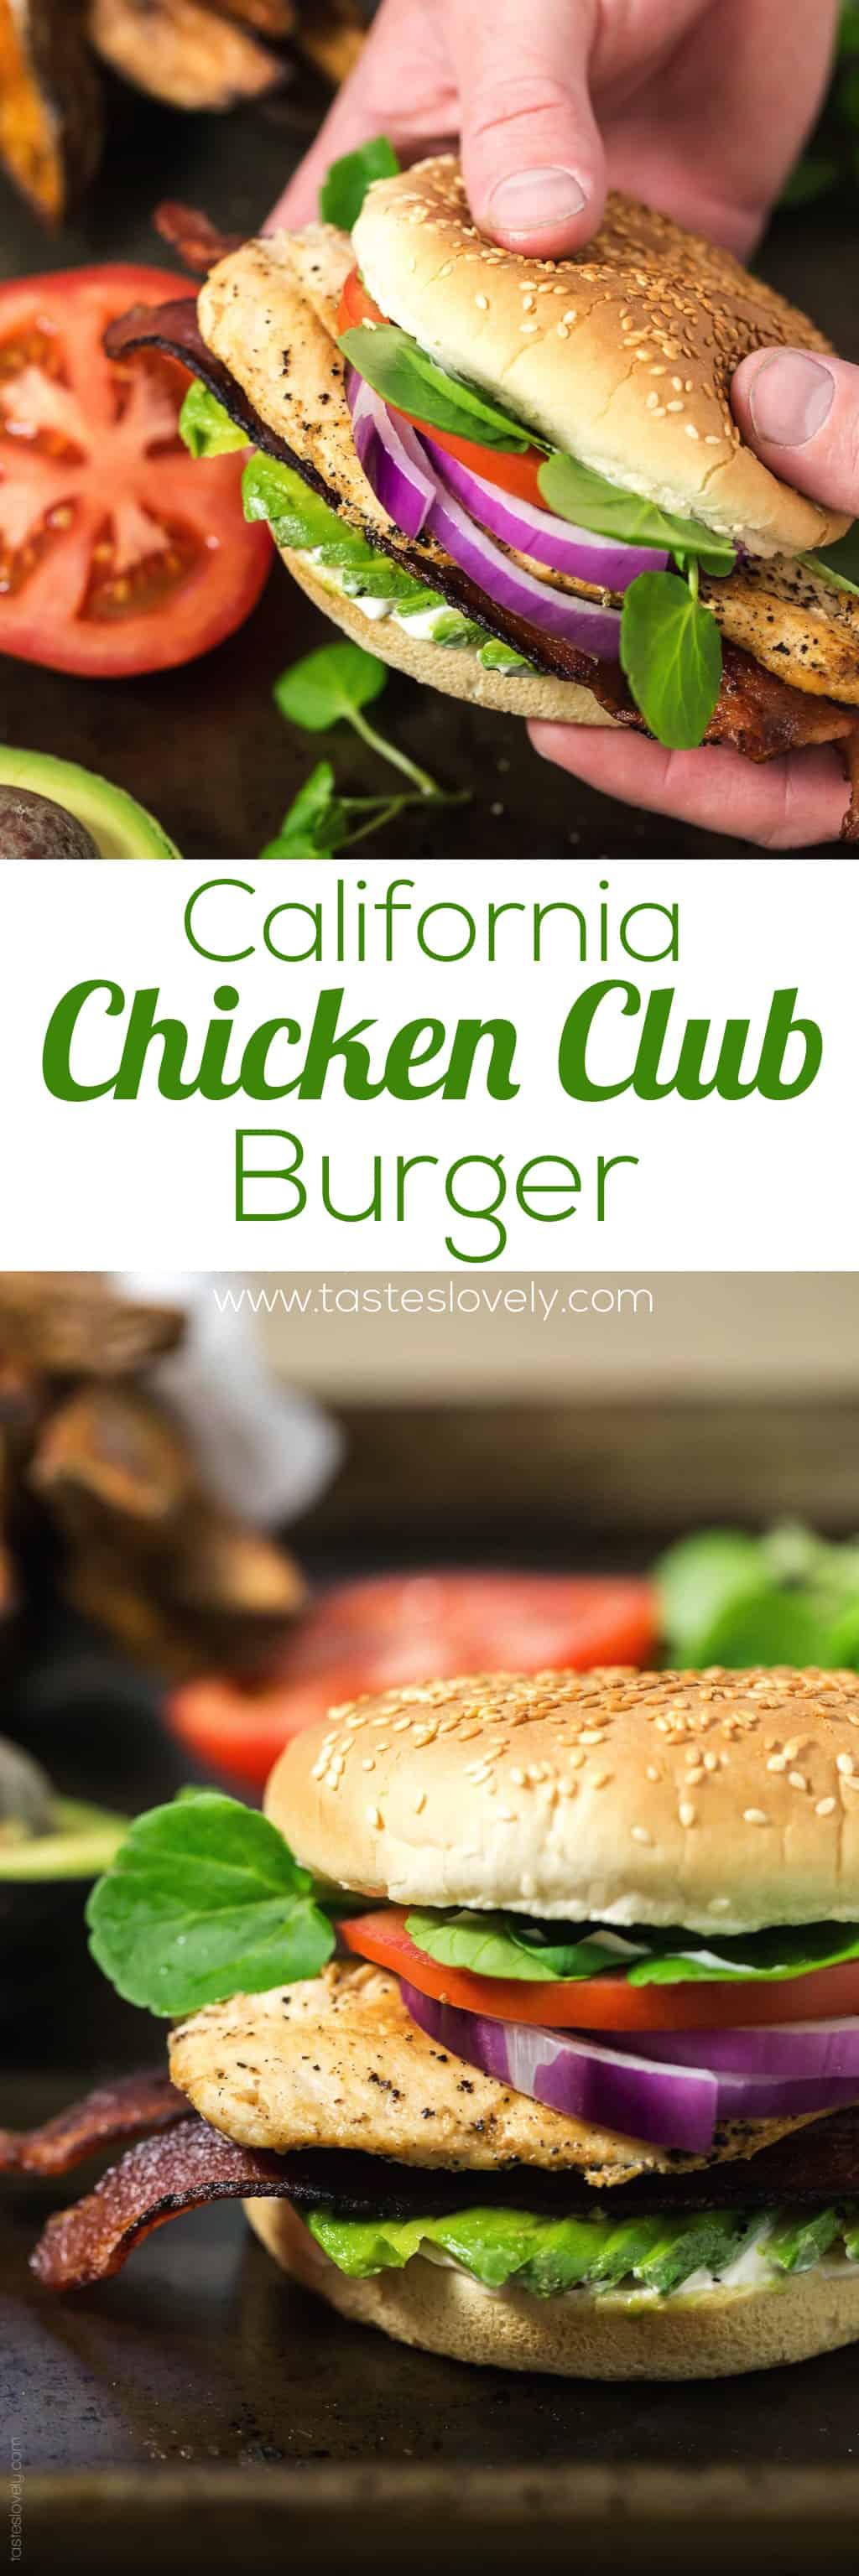 California Chicken Club Burger